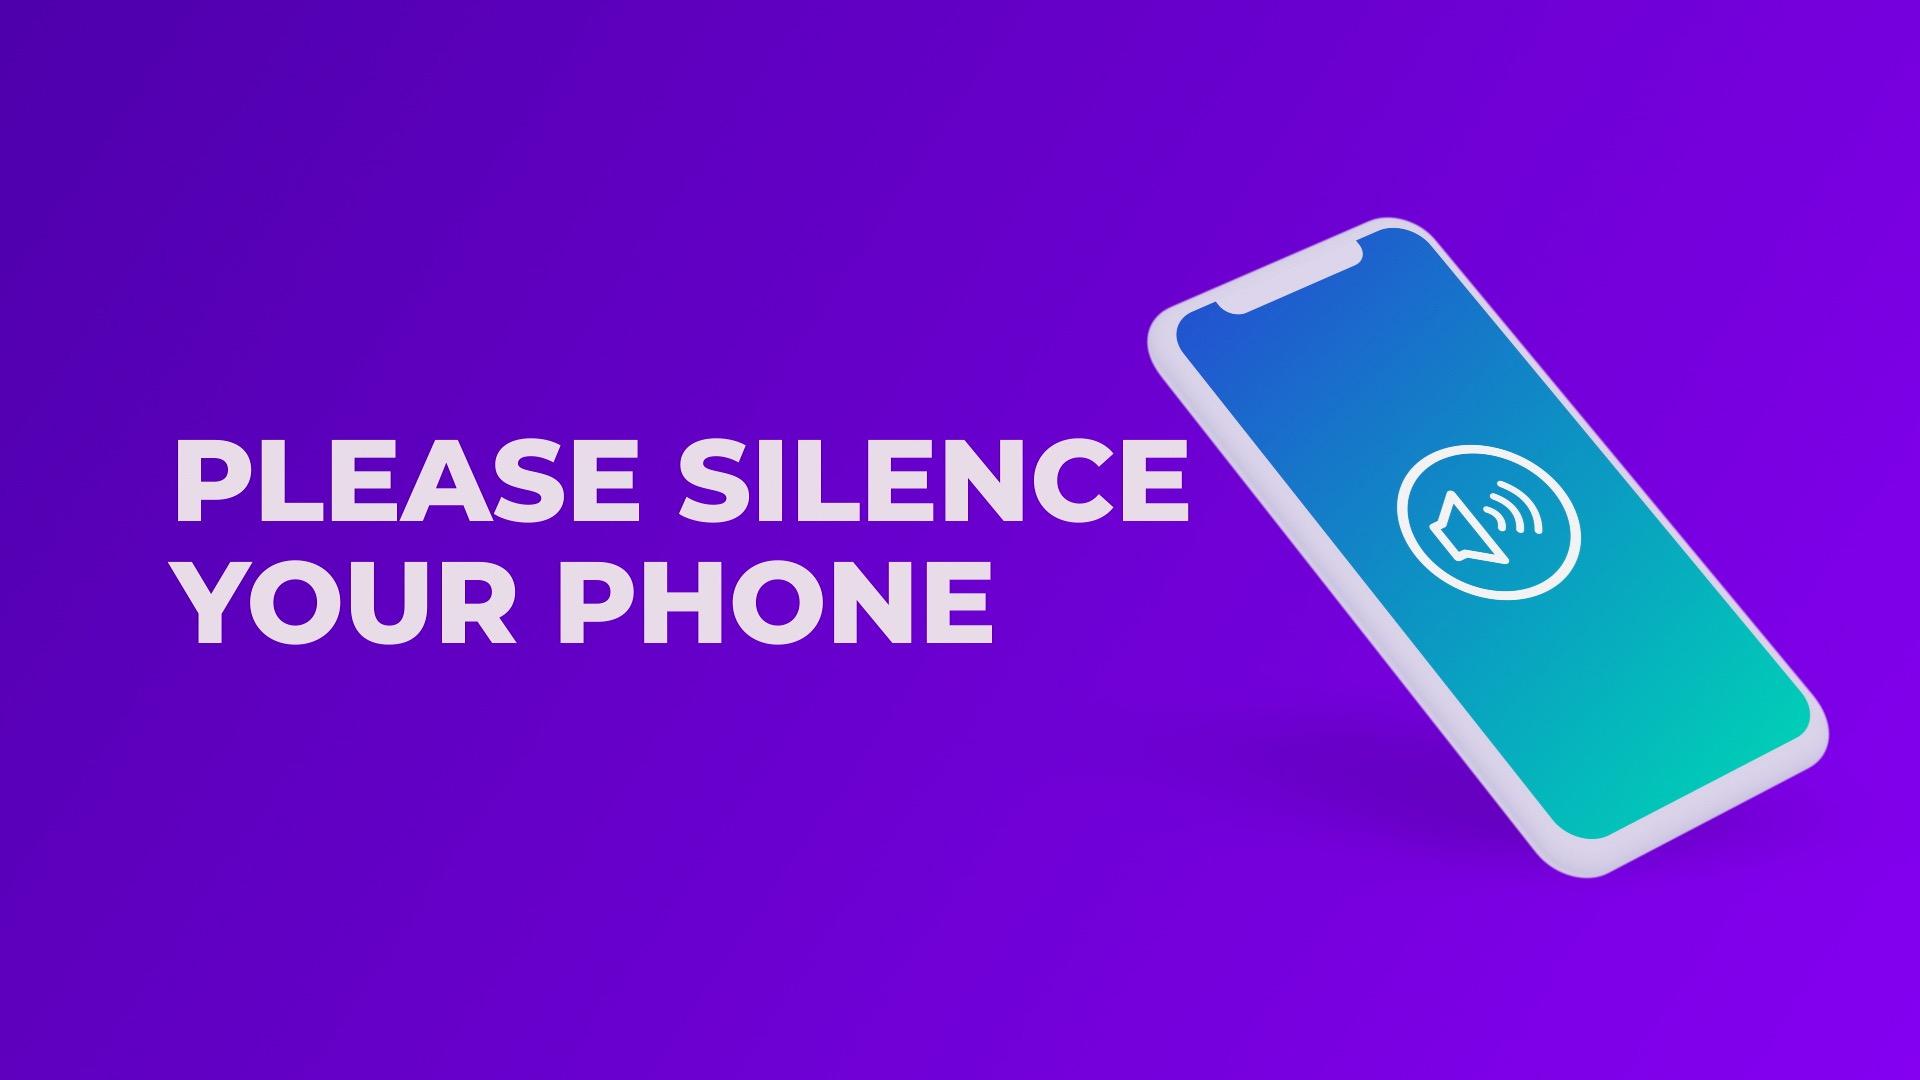 VMC-Phone-Silence-01-Title.jpg